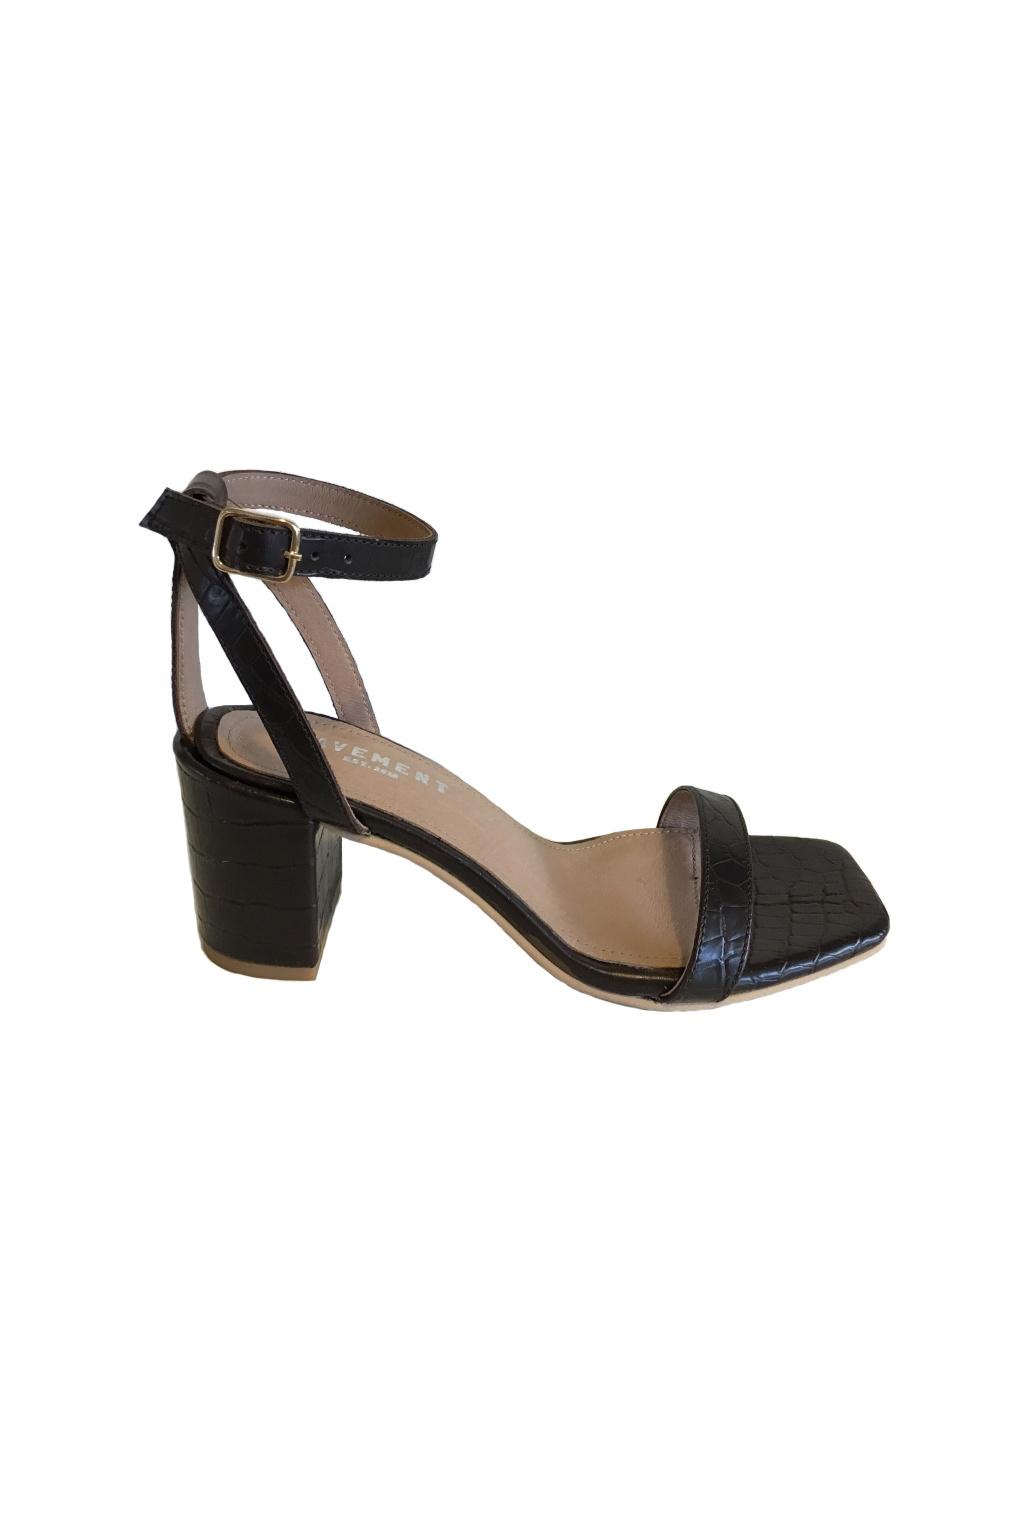 Else Sandal - Black Croco-1